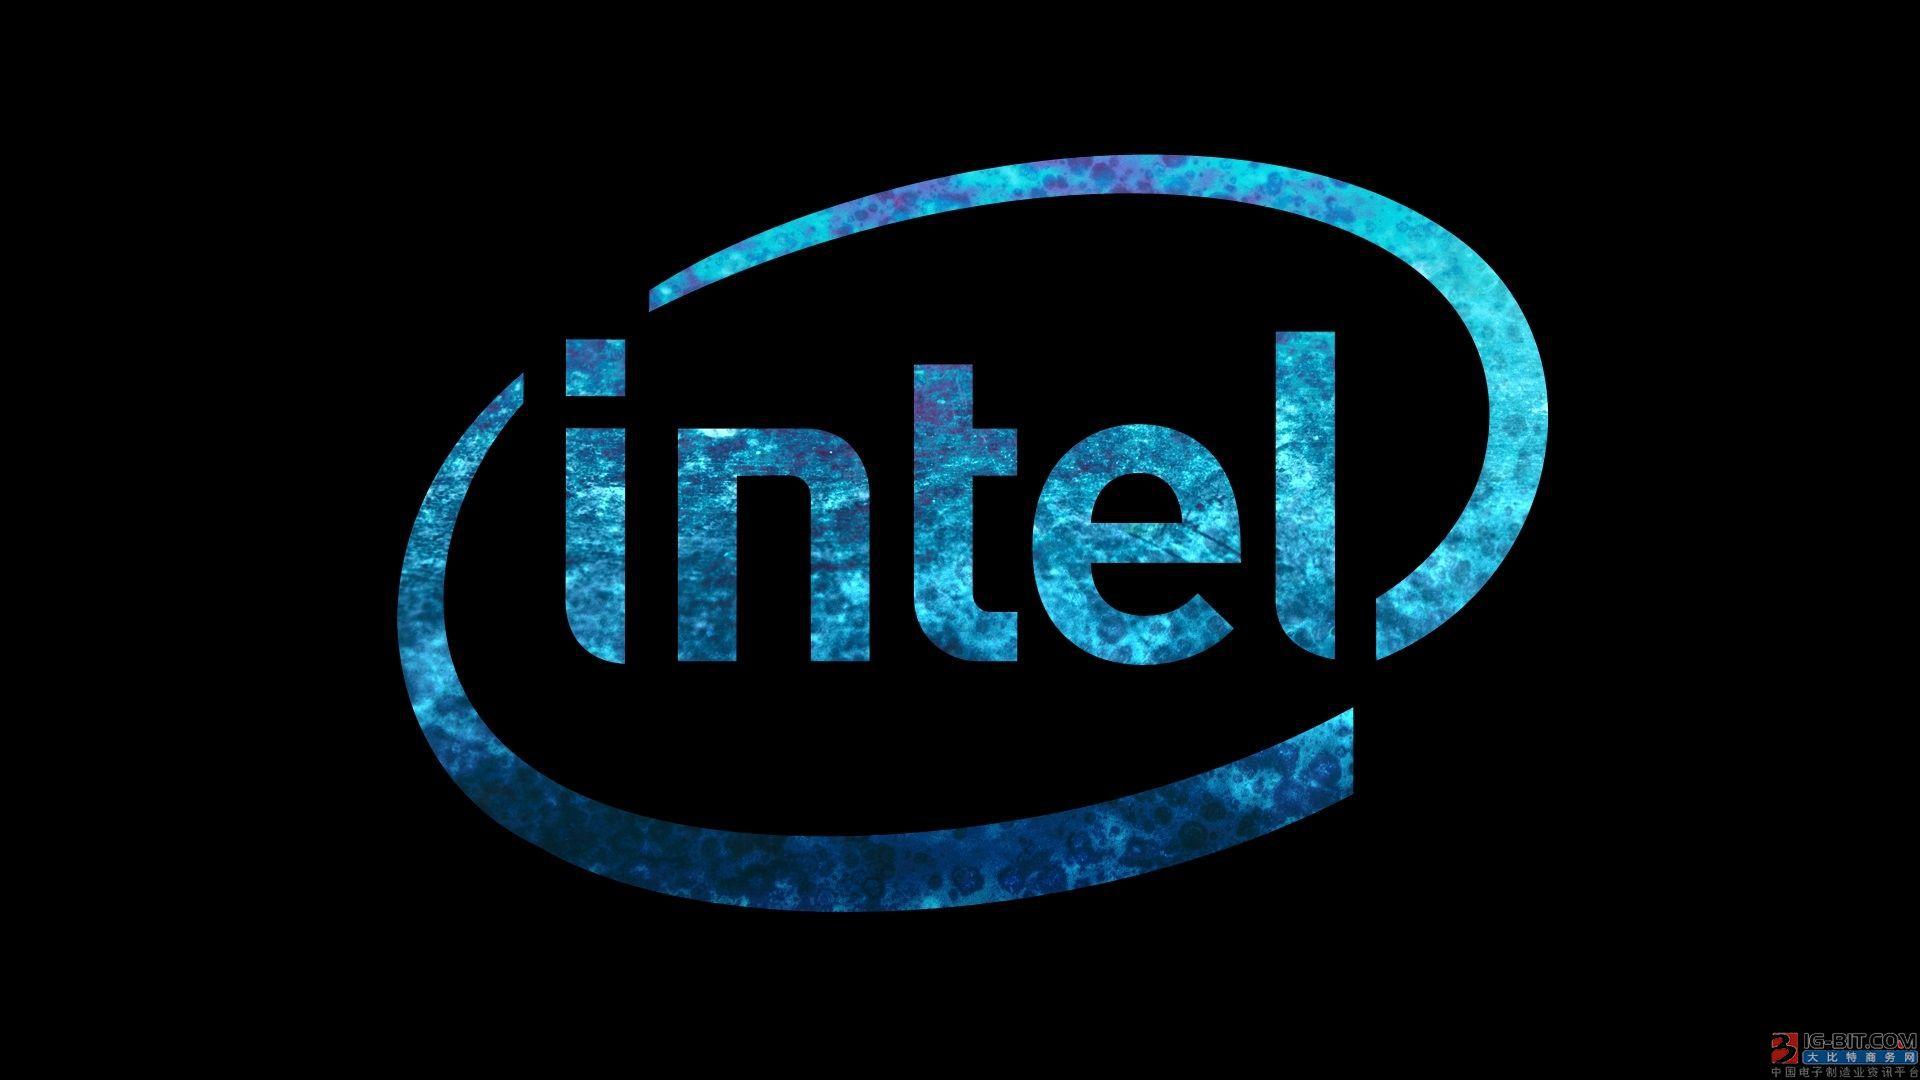 3D封装/GPU/CPU架构尽现 Intel六大领域战略力拓市场